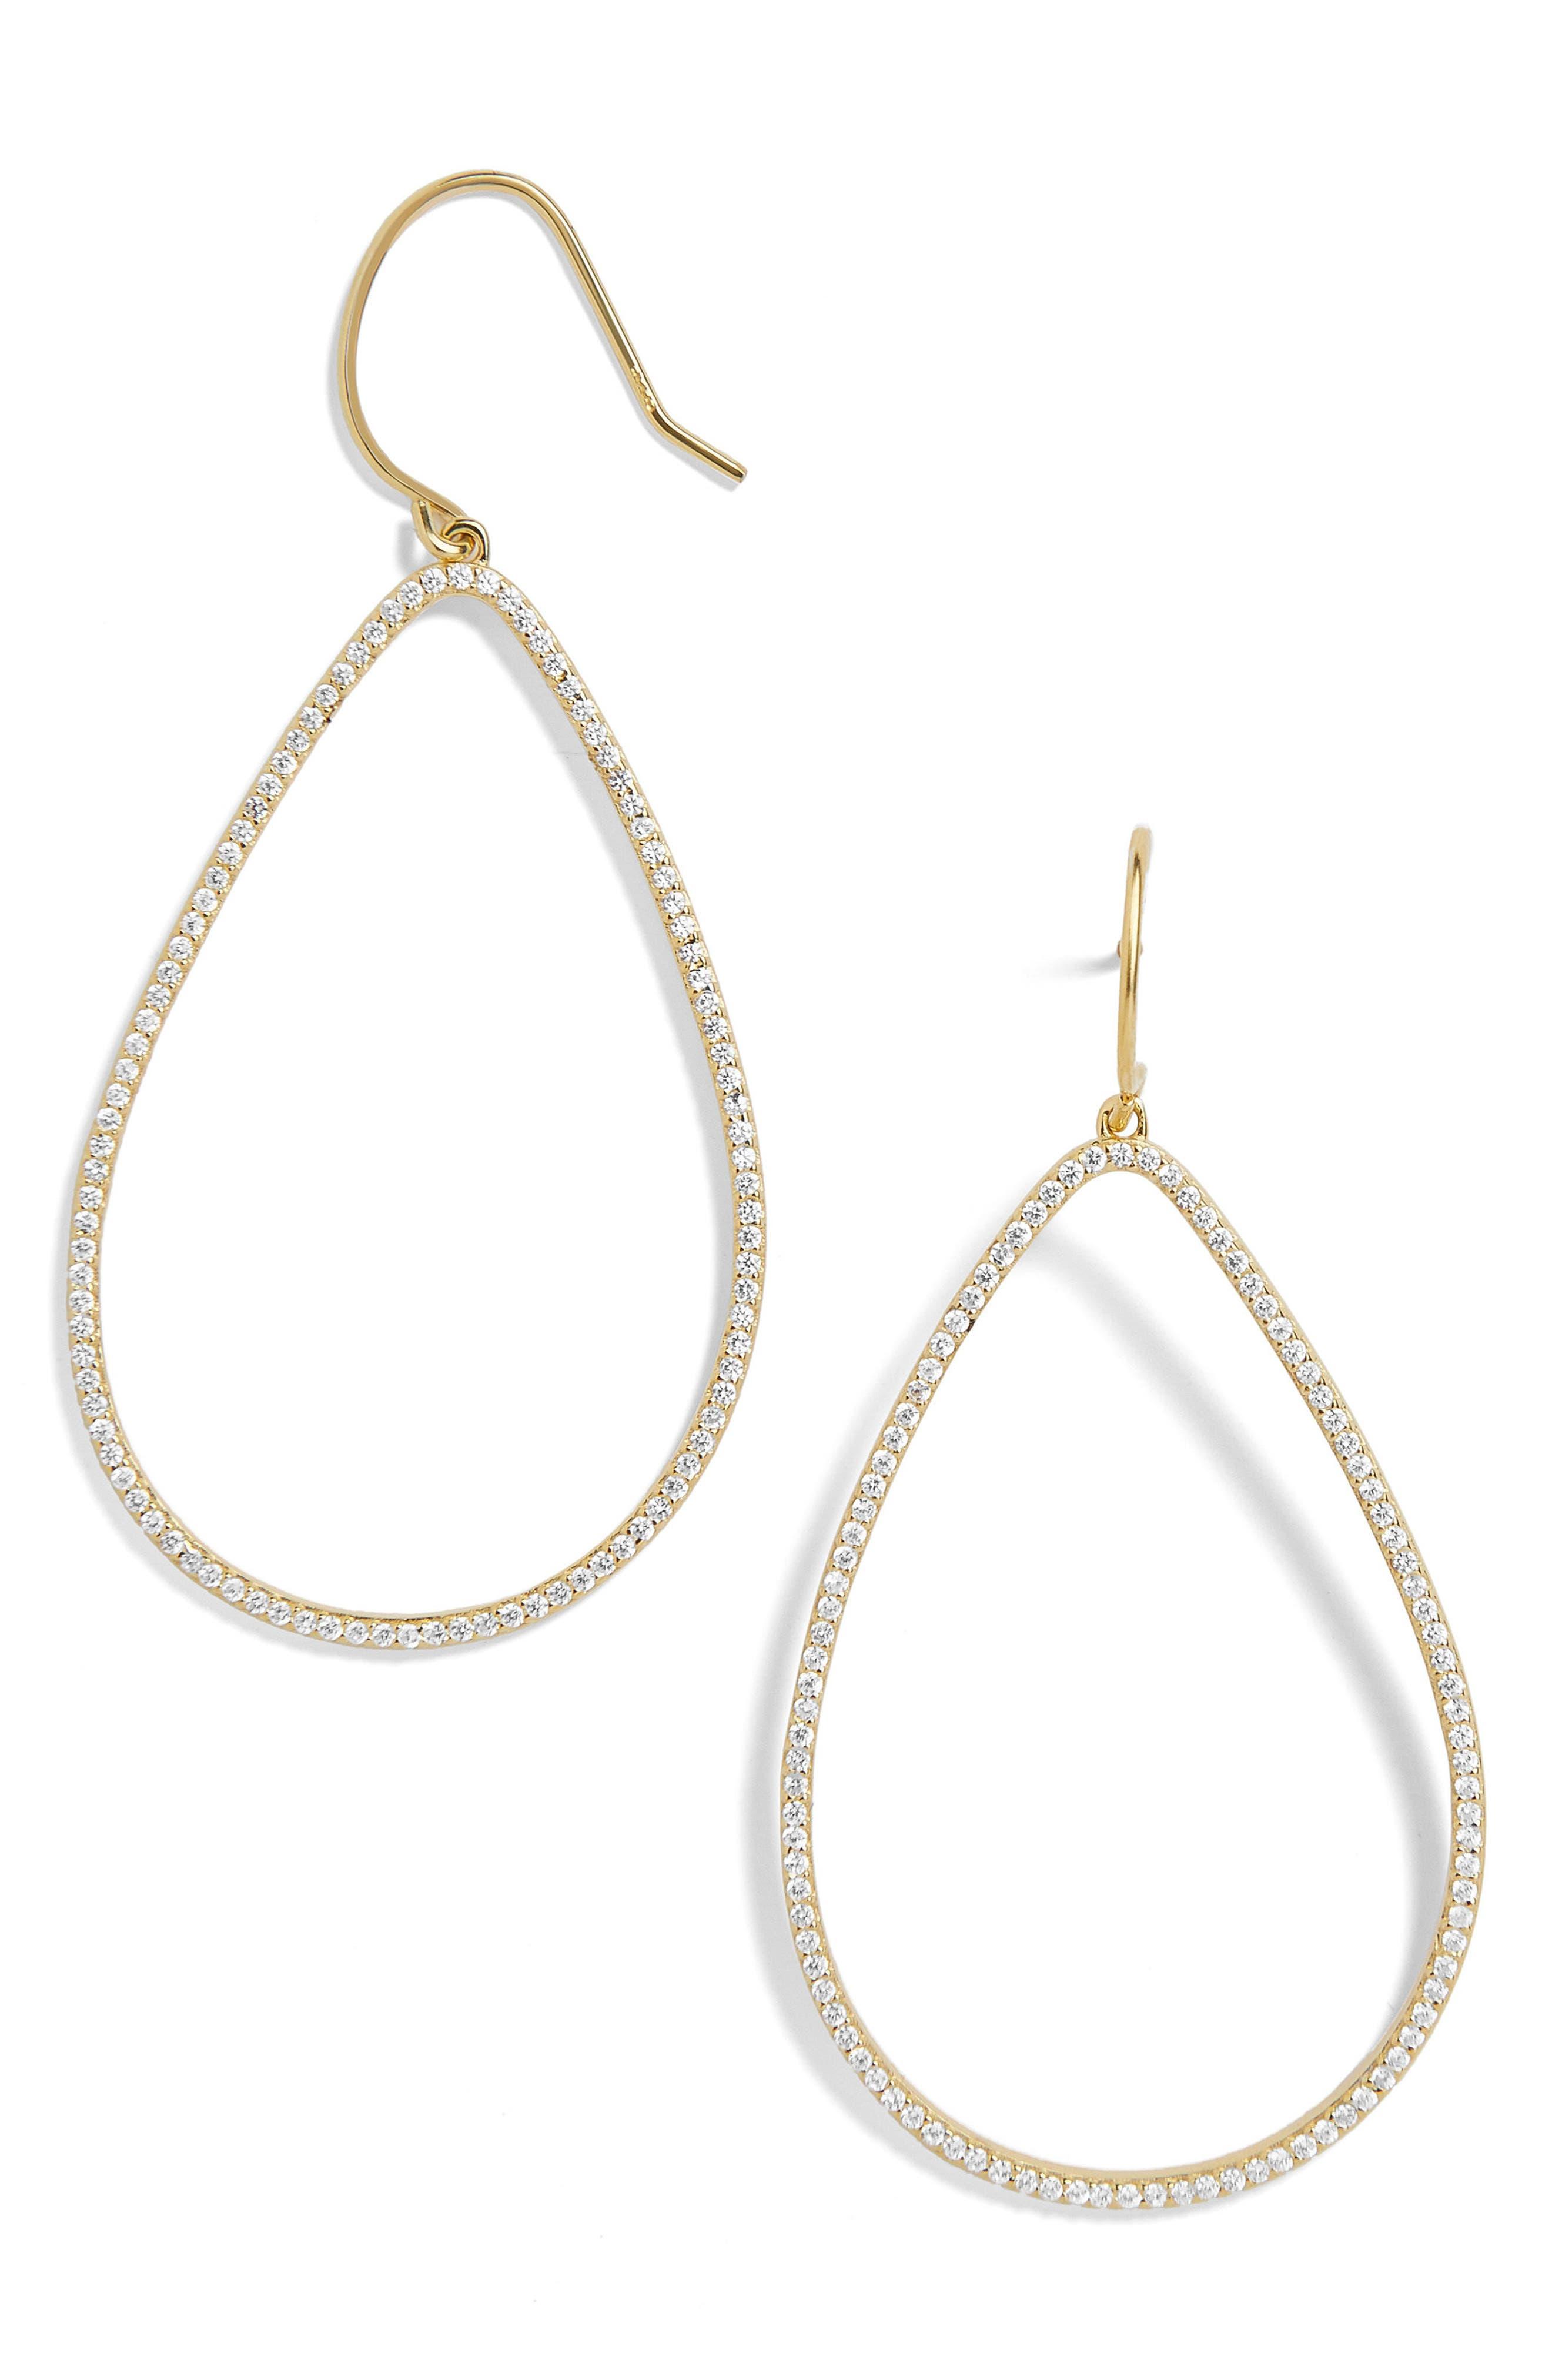 Everyday Fine Fishhook Crystal Teardrop Earrings,                             Main thumbnail 1, color,                             GOLD